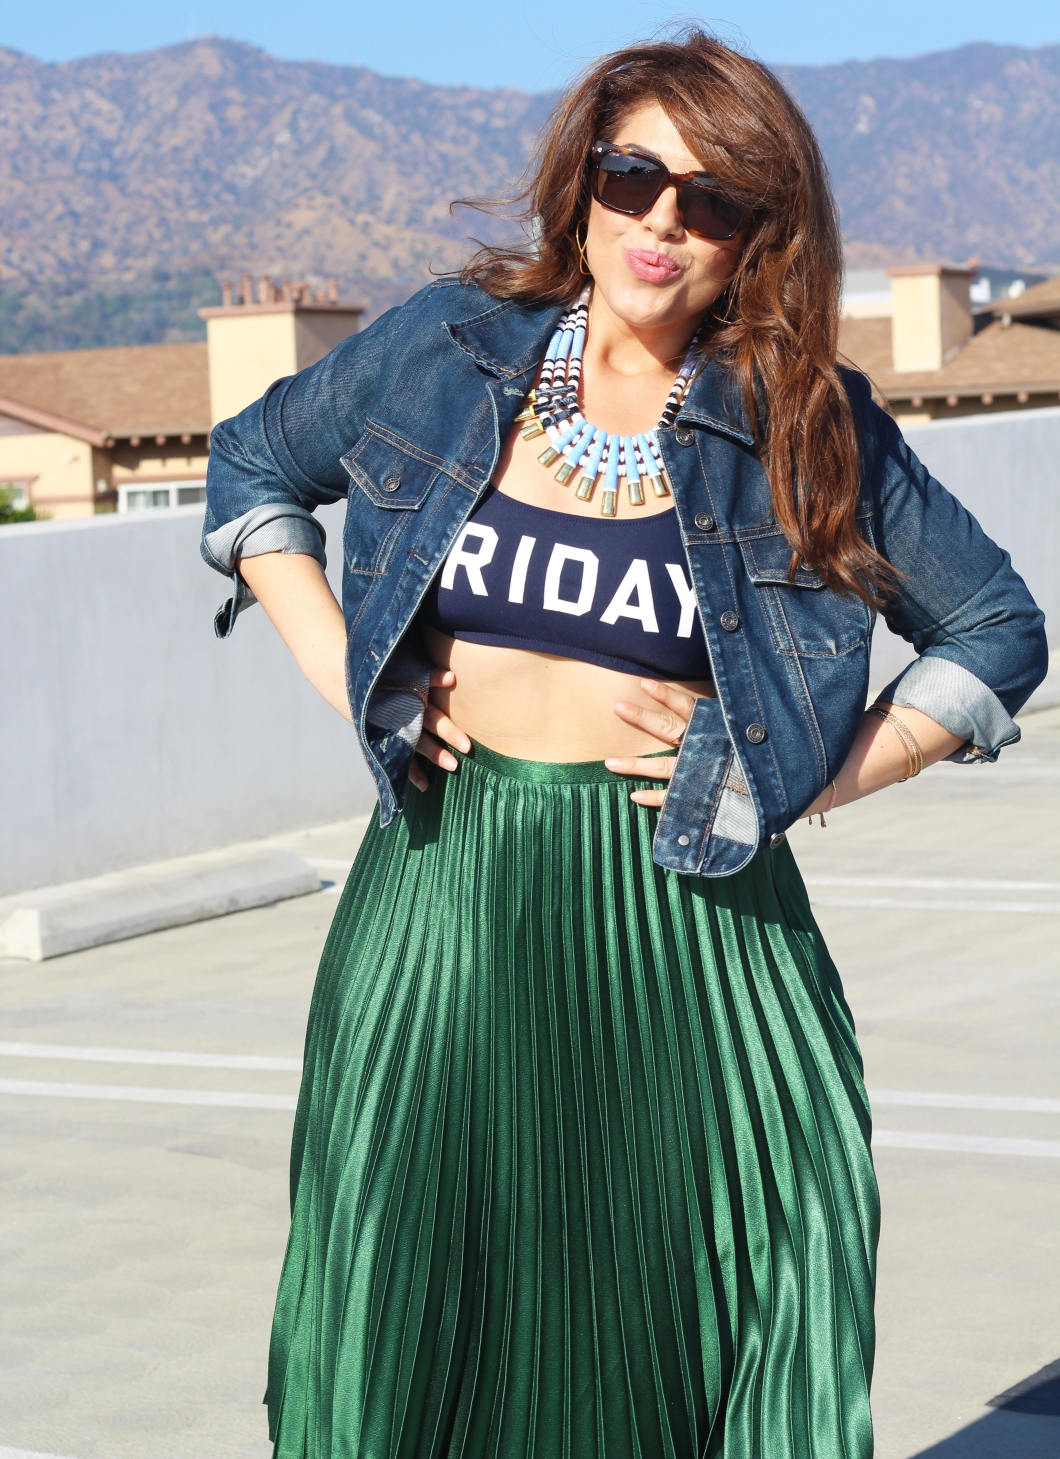 Zara green skirt_o8_front shot